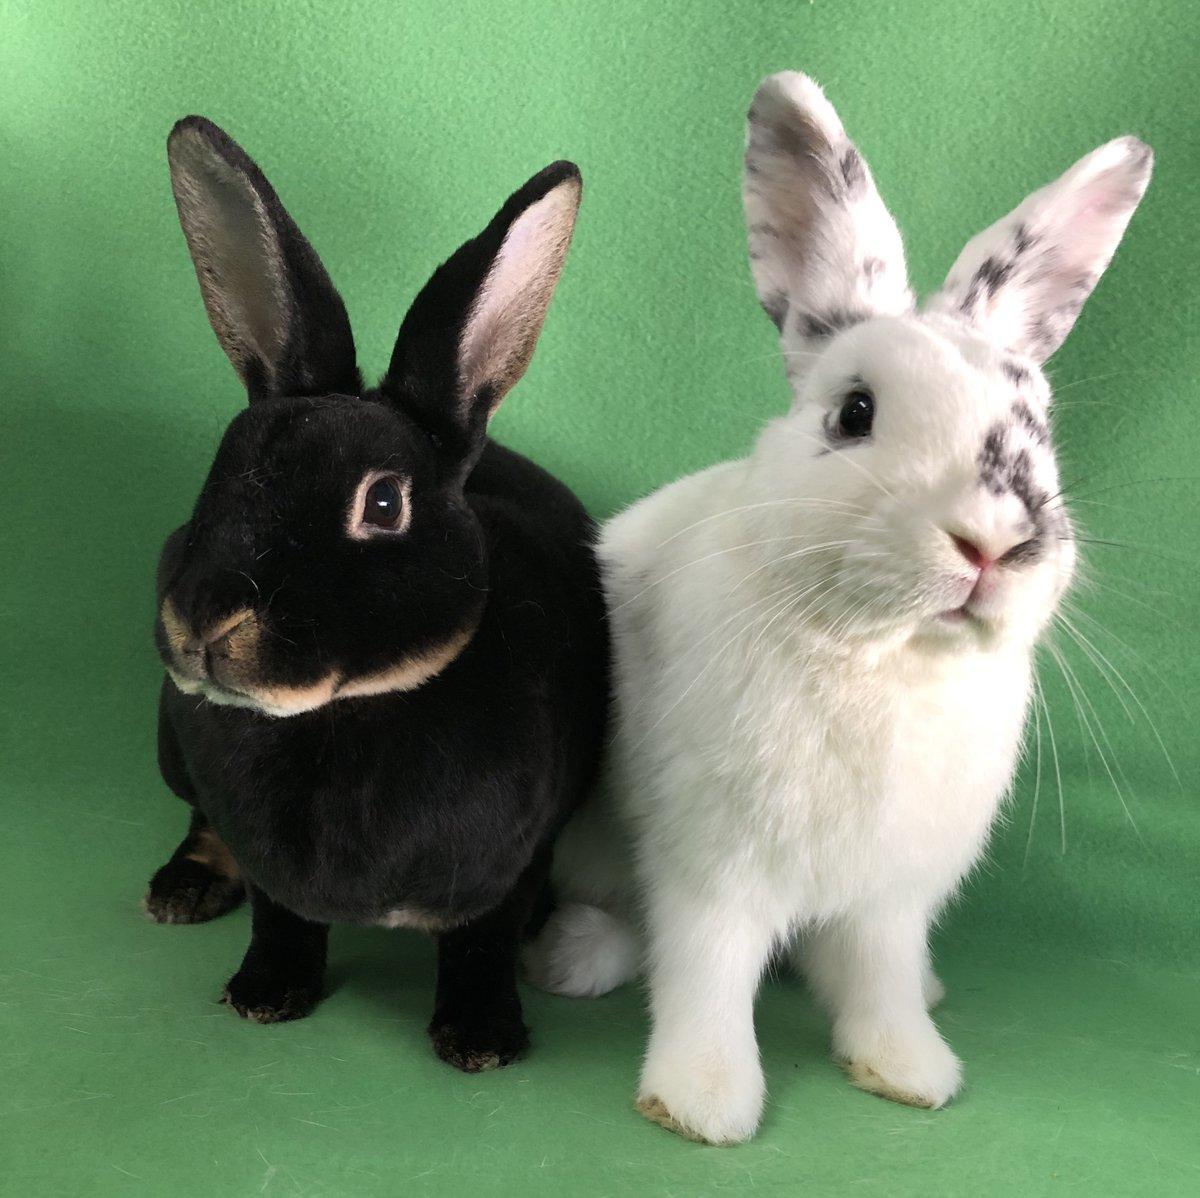 Peanut & Dunkin are adult #rabbits from #HaltomCity, TX. petfinder.com/petdetail/4885…